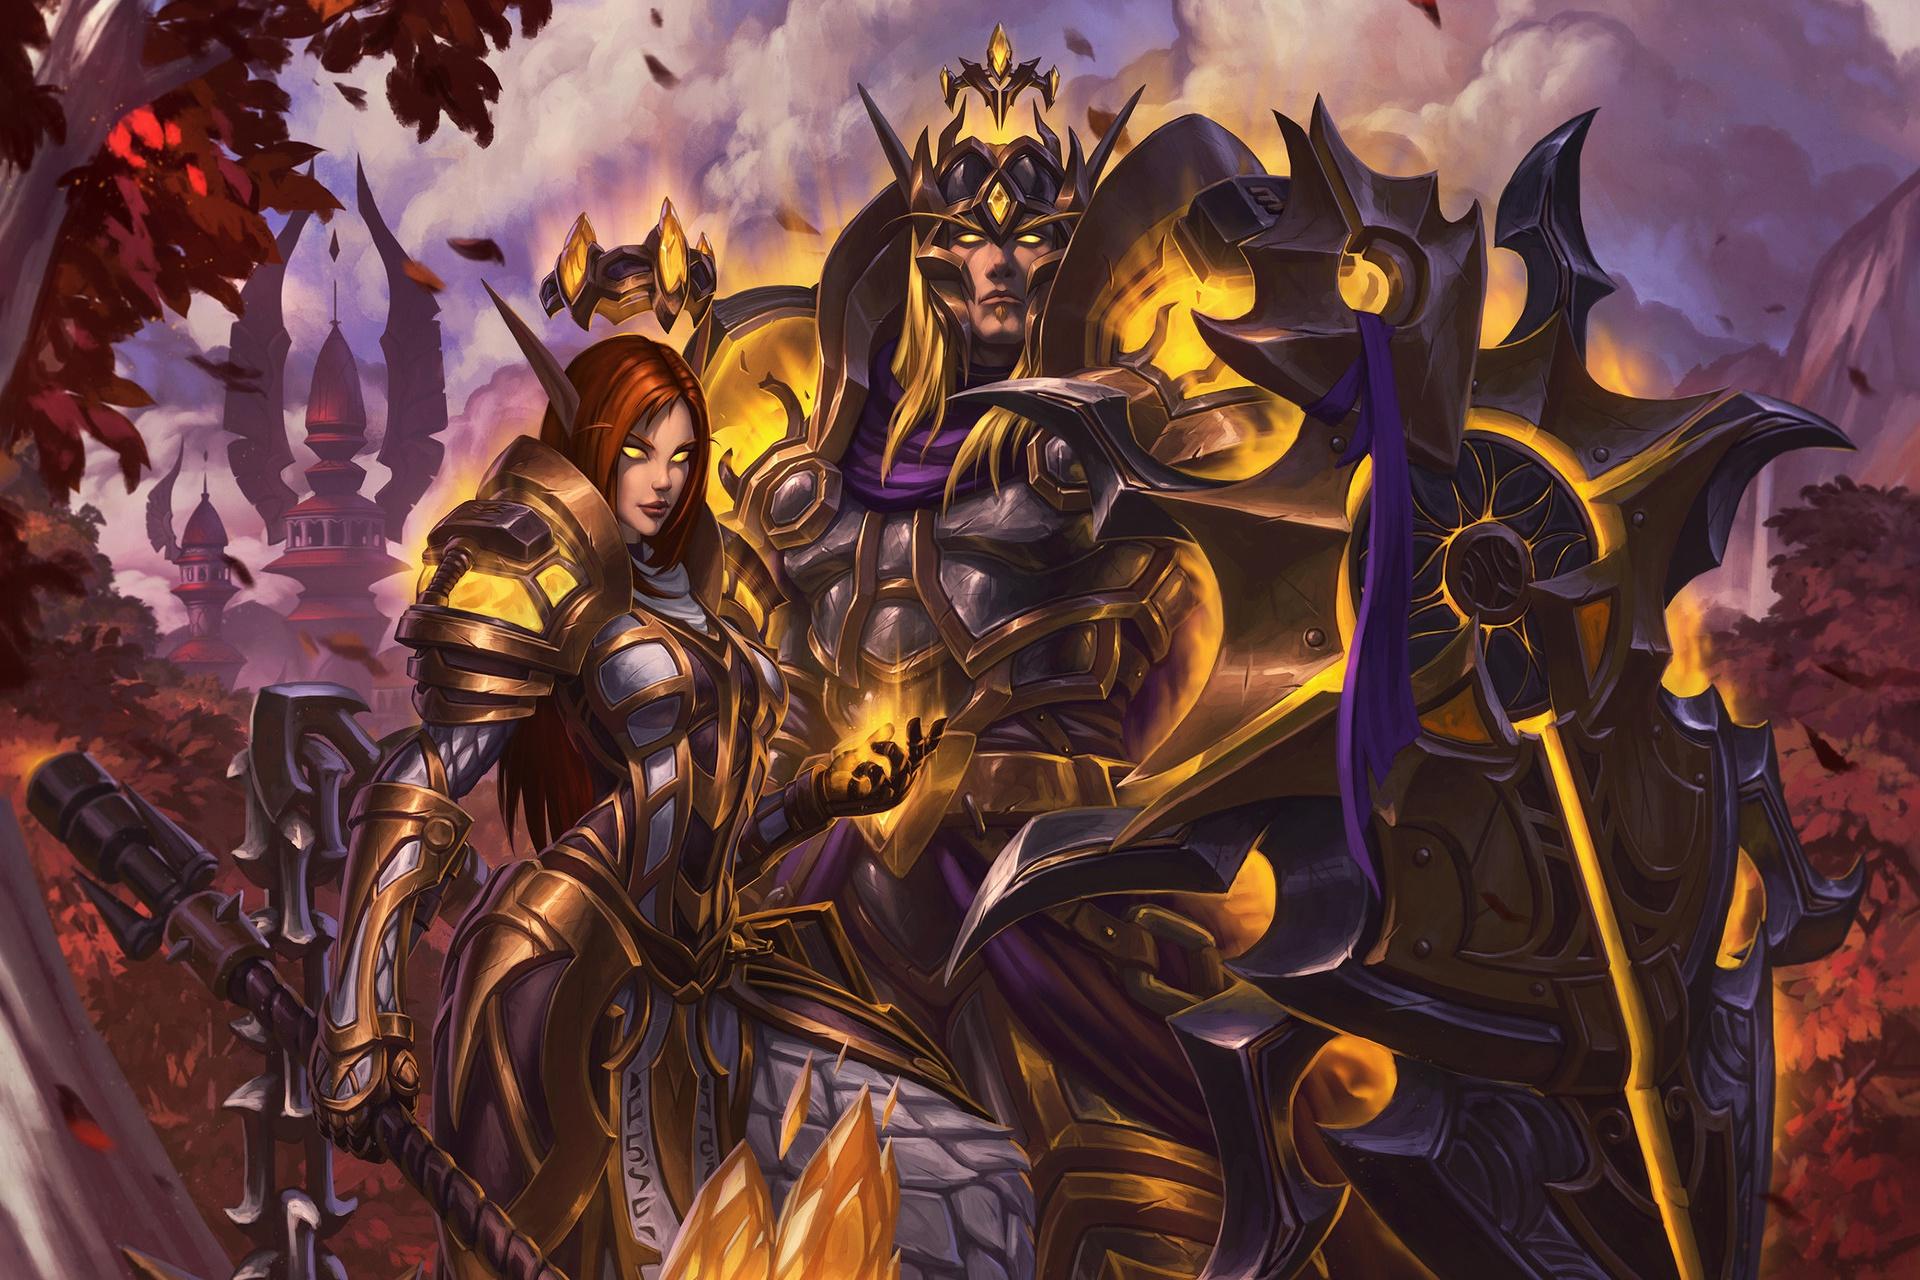 Armor Elf Pointed Ears Shield Warrior Woman Warrior World Of Warcraft 1920x1280